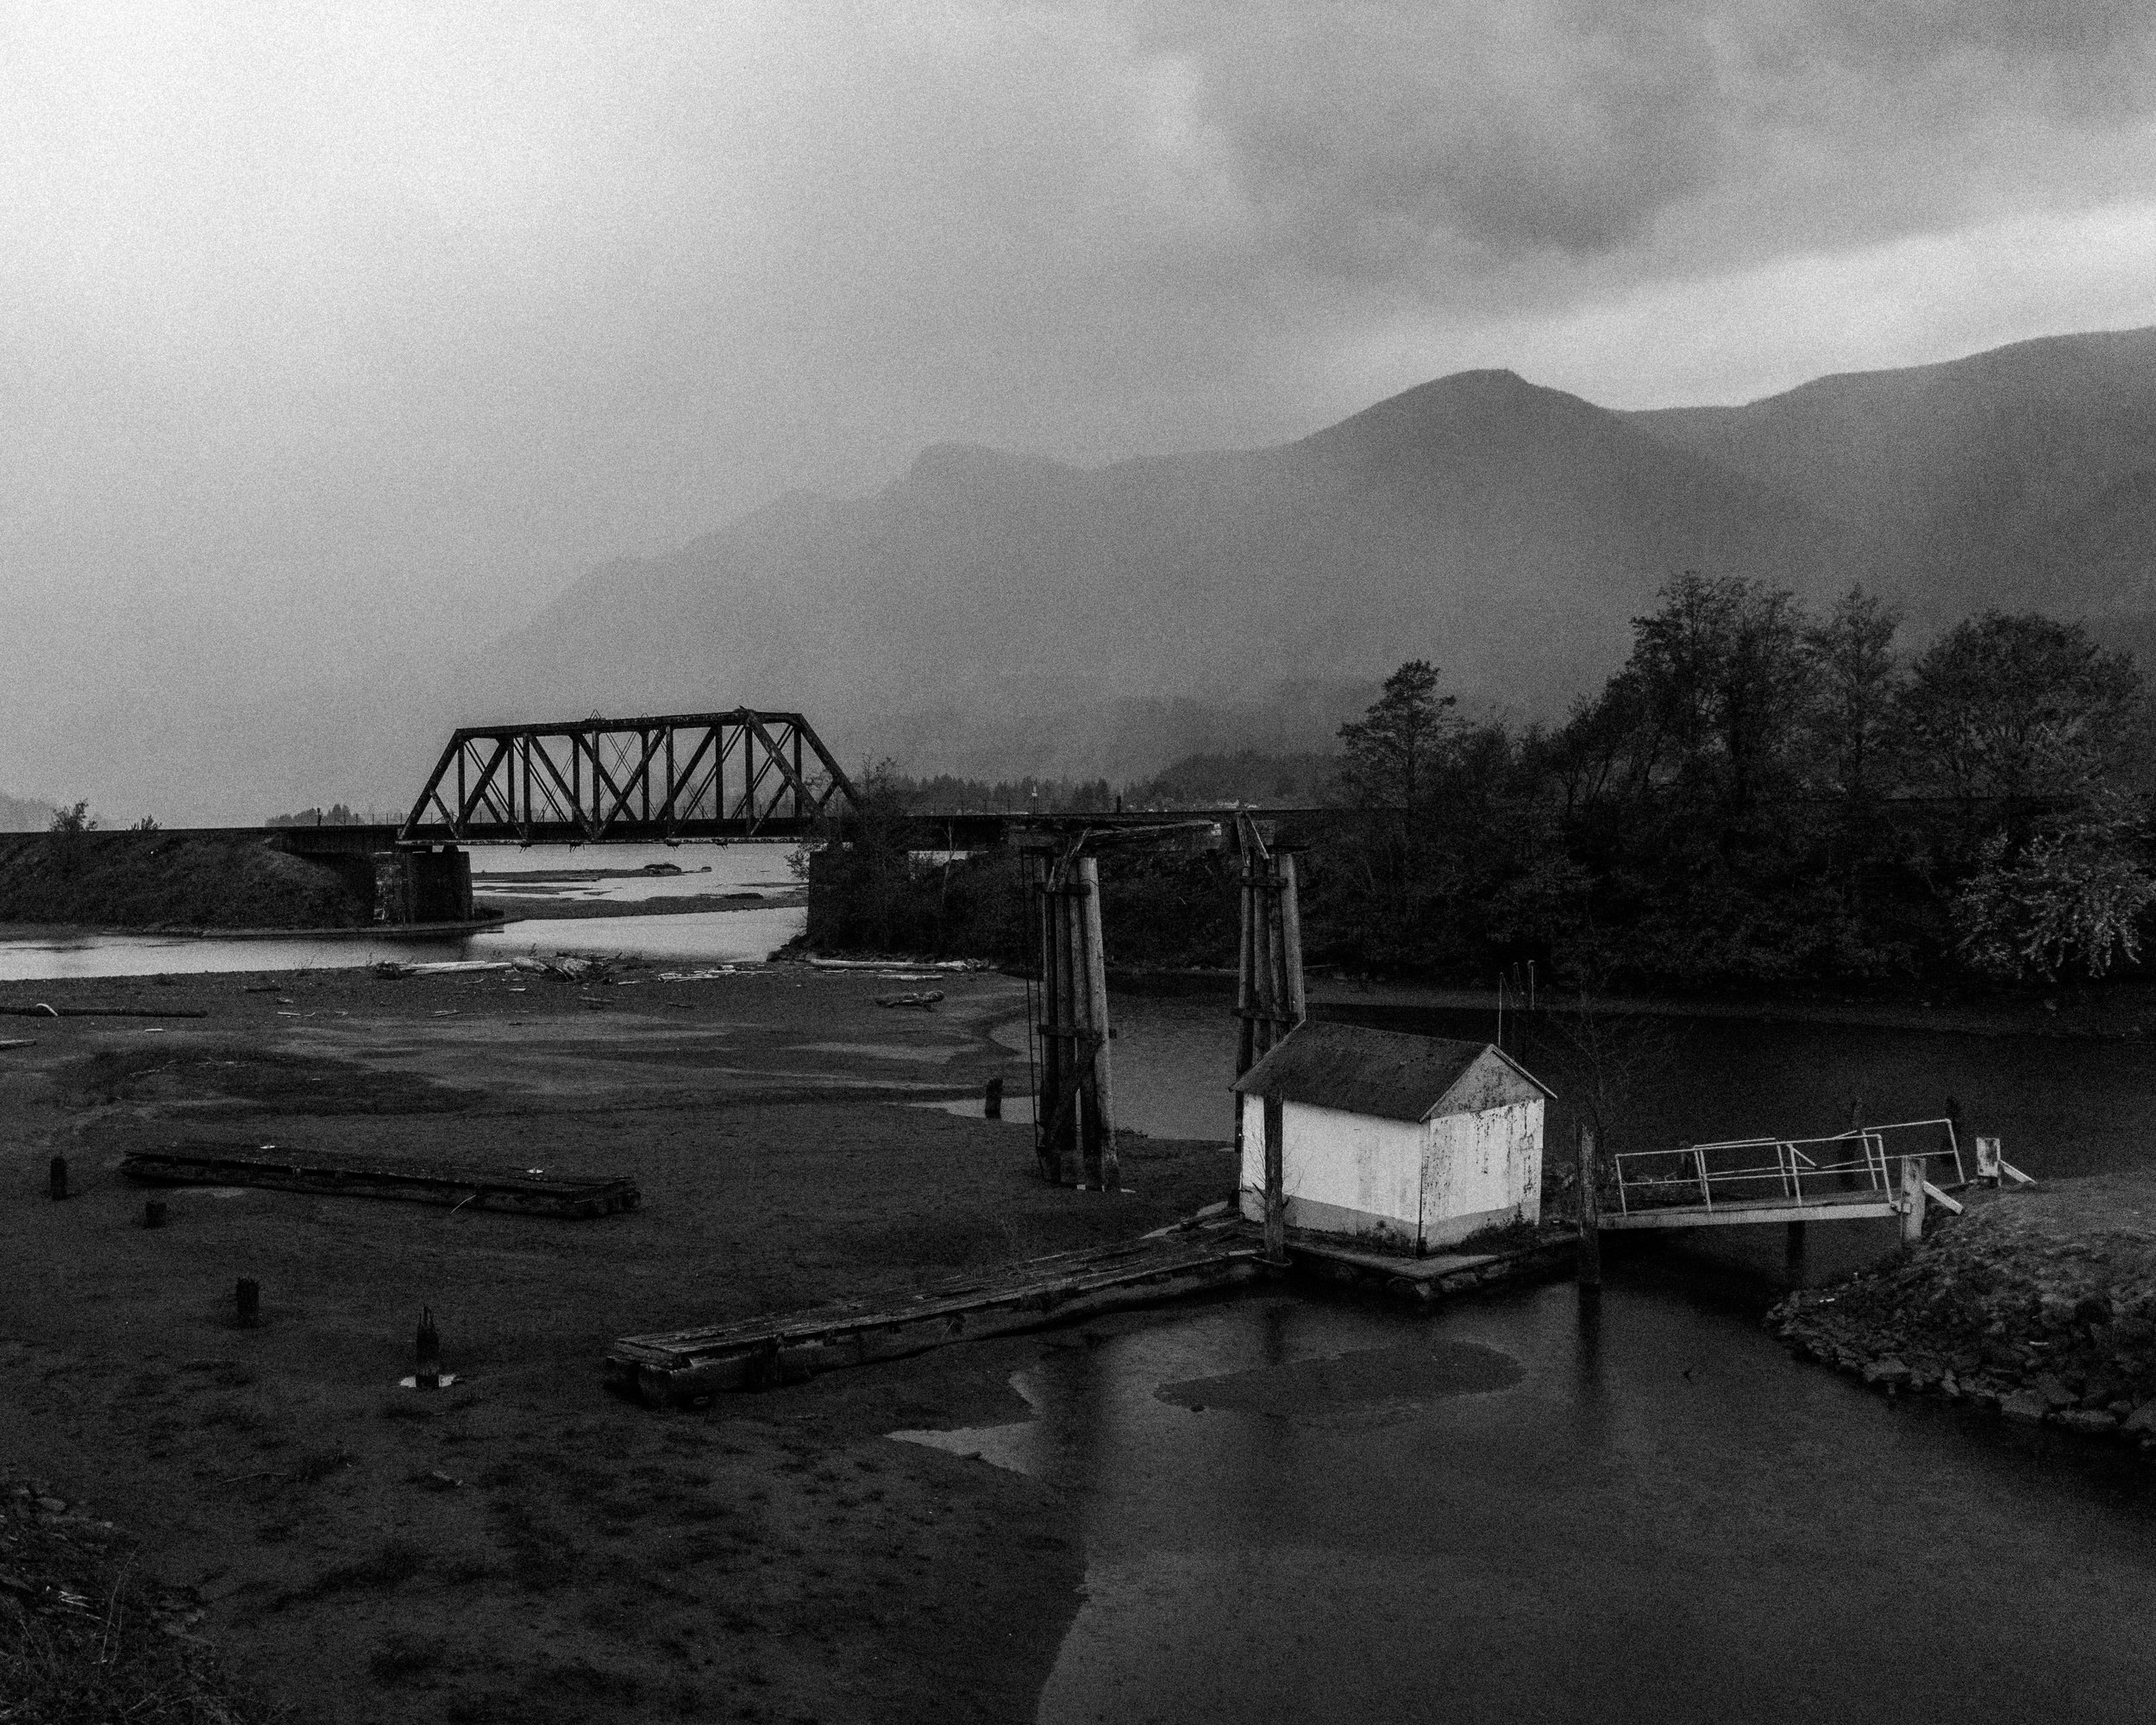 Boathouse and railroad bridge, April 2016